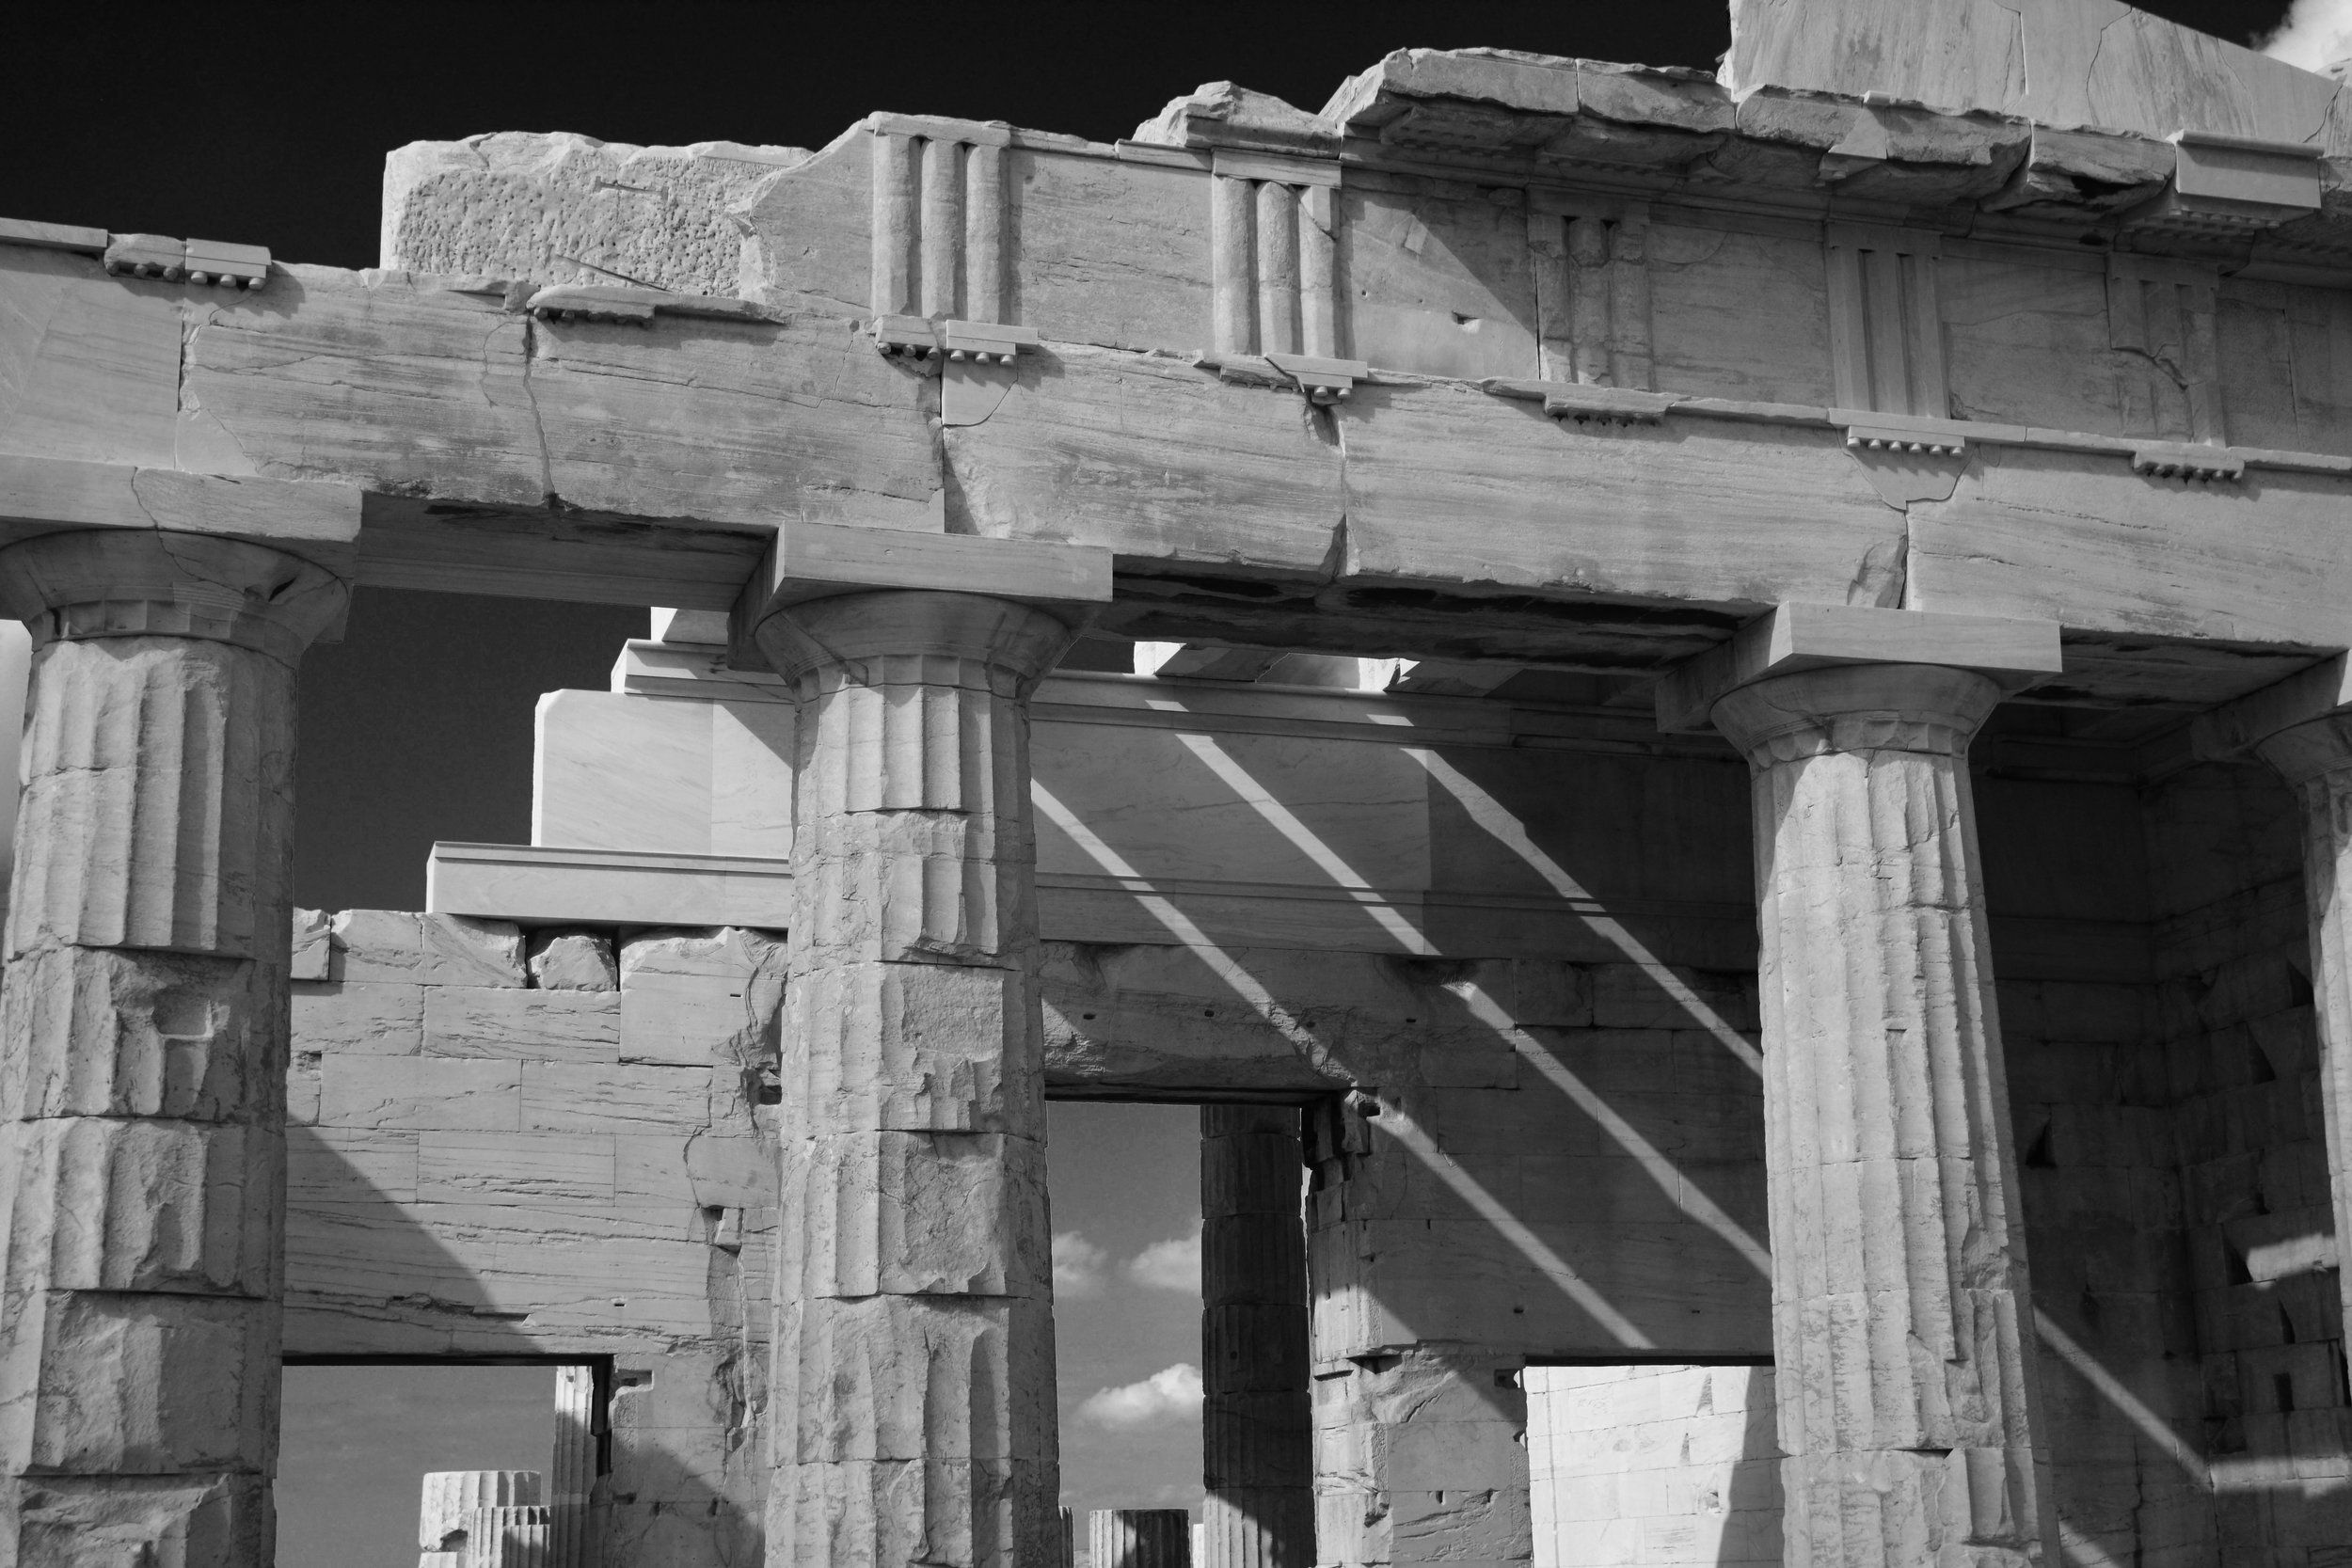 Acropolis, Greece 2016